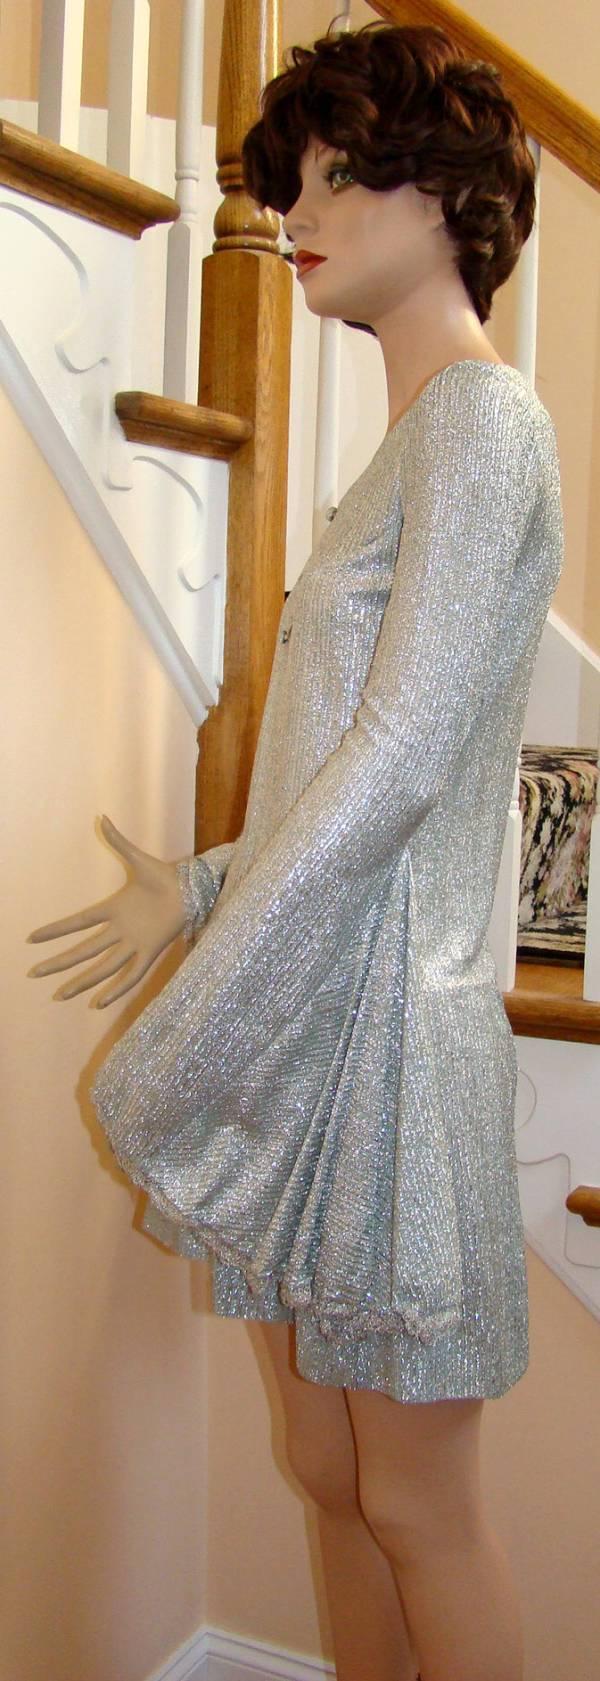 Vintage 1960s BETSEY JOHNSON for Paraphernalia Silver Lame MiniDress ...